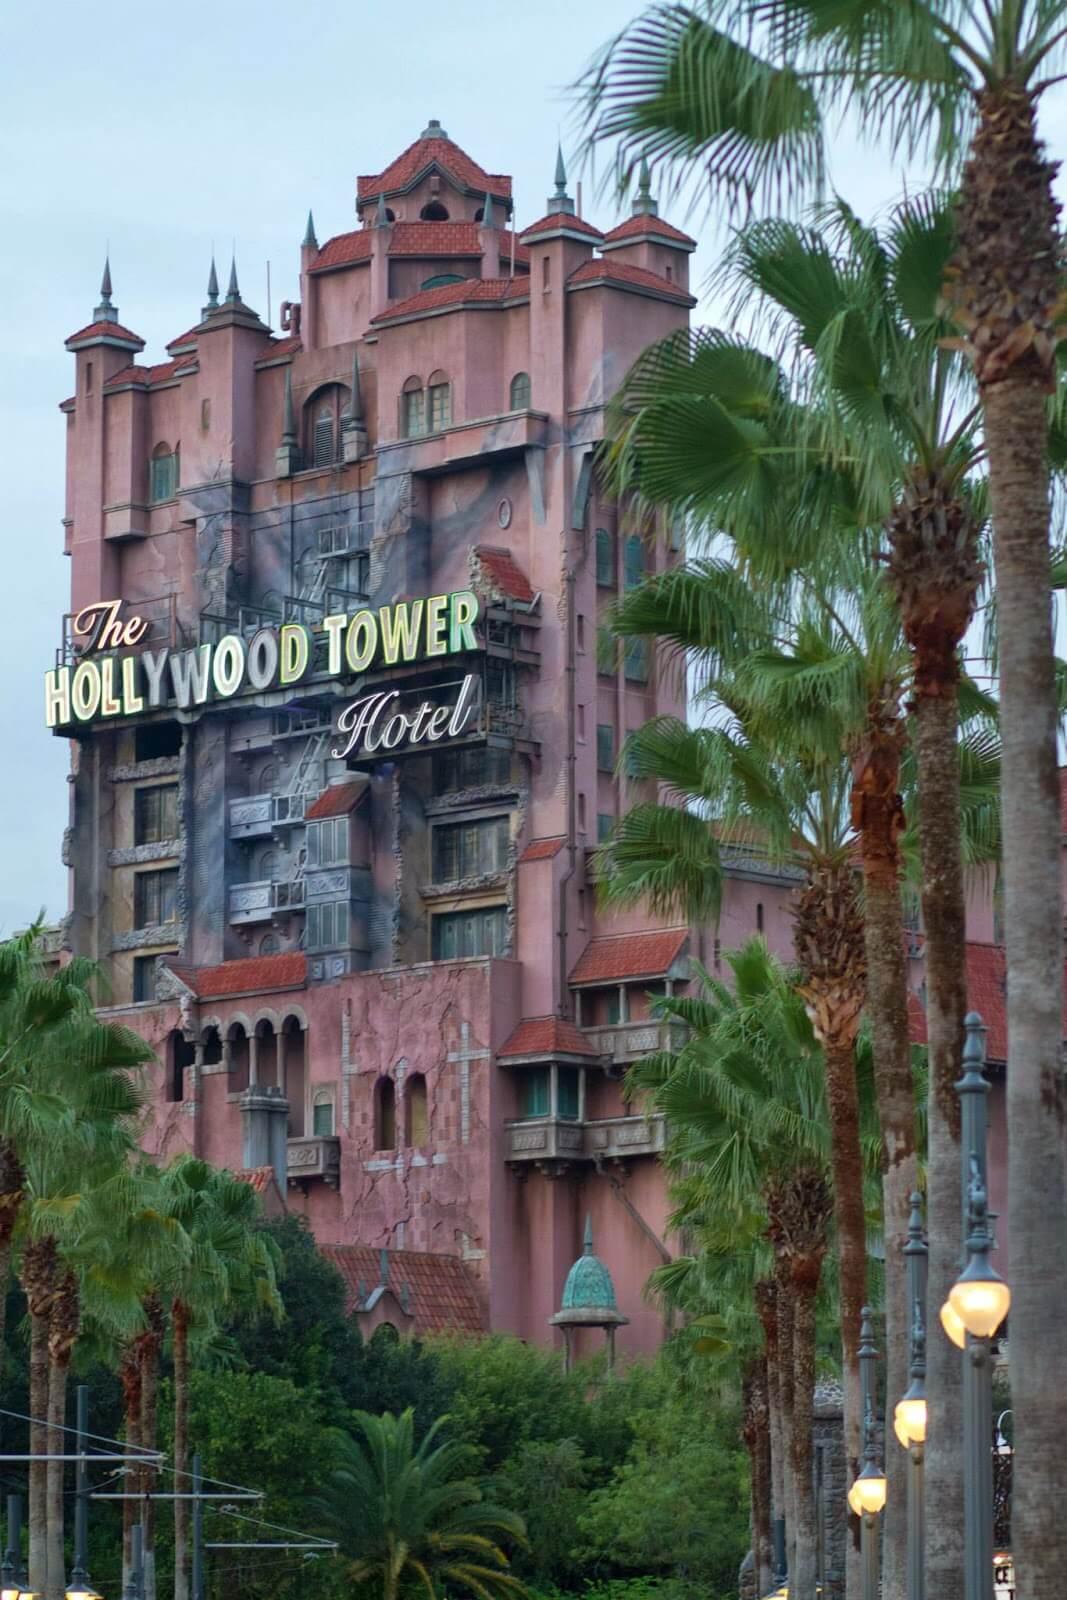 Hollywood Tower of Terror ride at Hollywood Studios